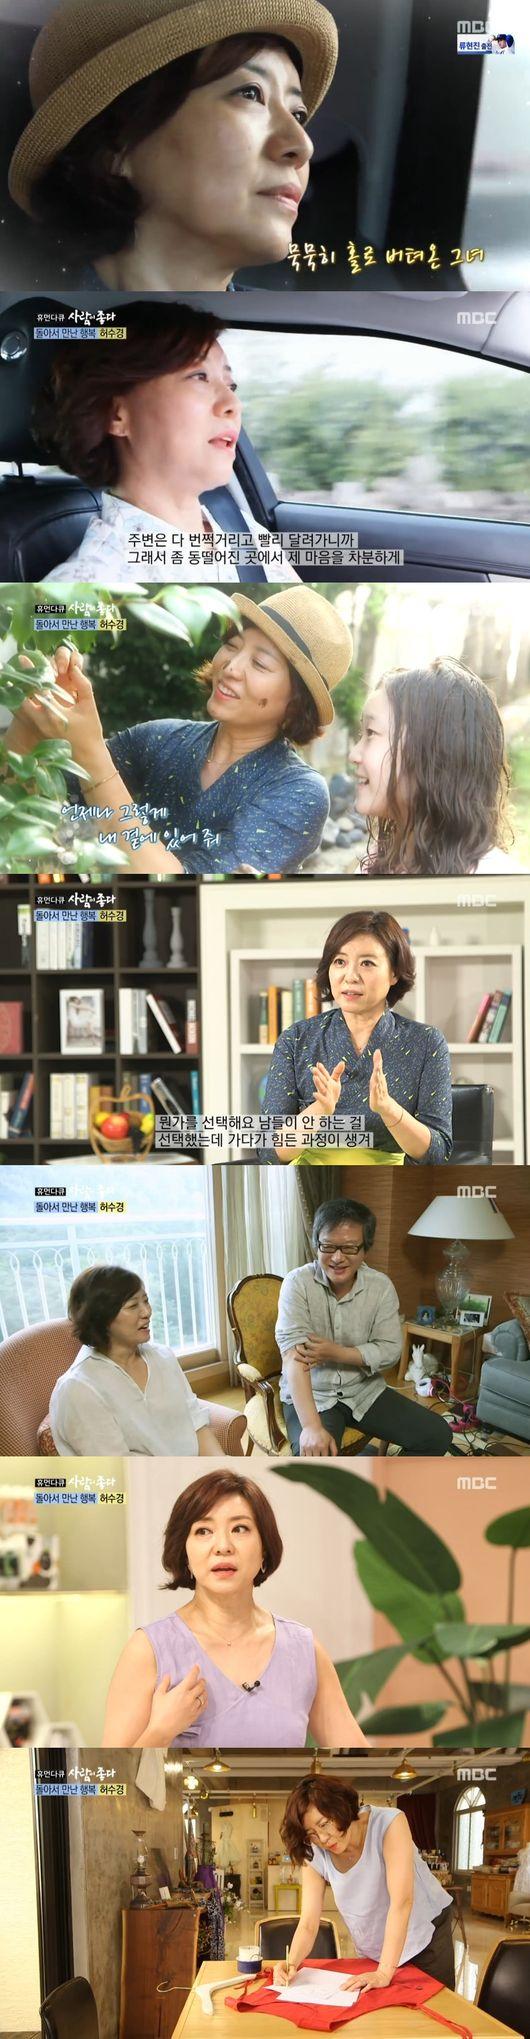 [Oh!쎈 리뷰] '사람이좋다' 허수경의 인생2막 #제주도 #딸 #세번째결혼